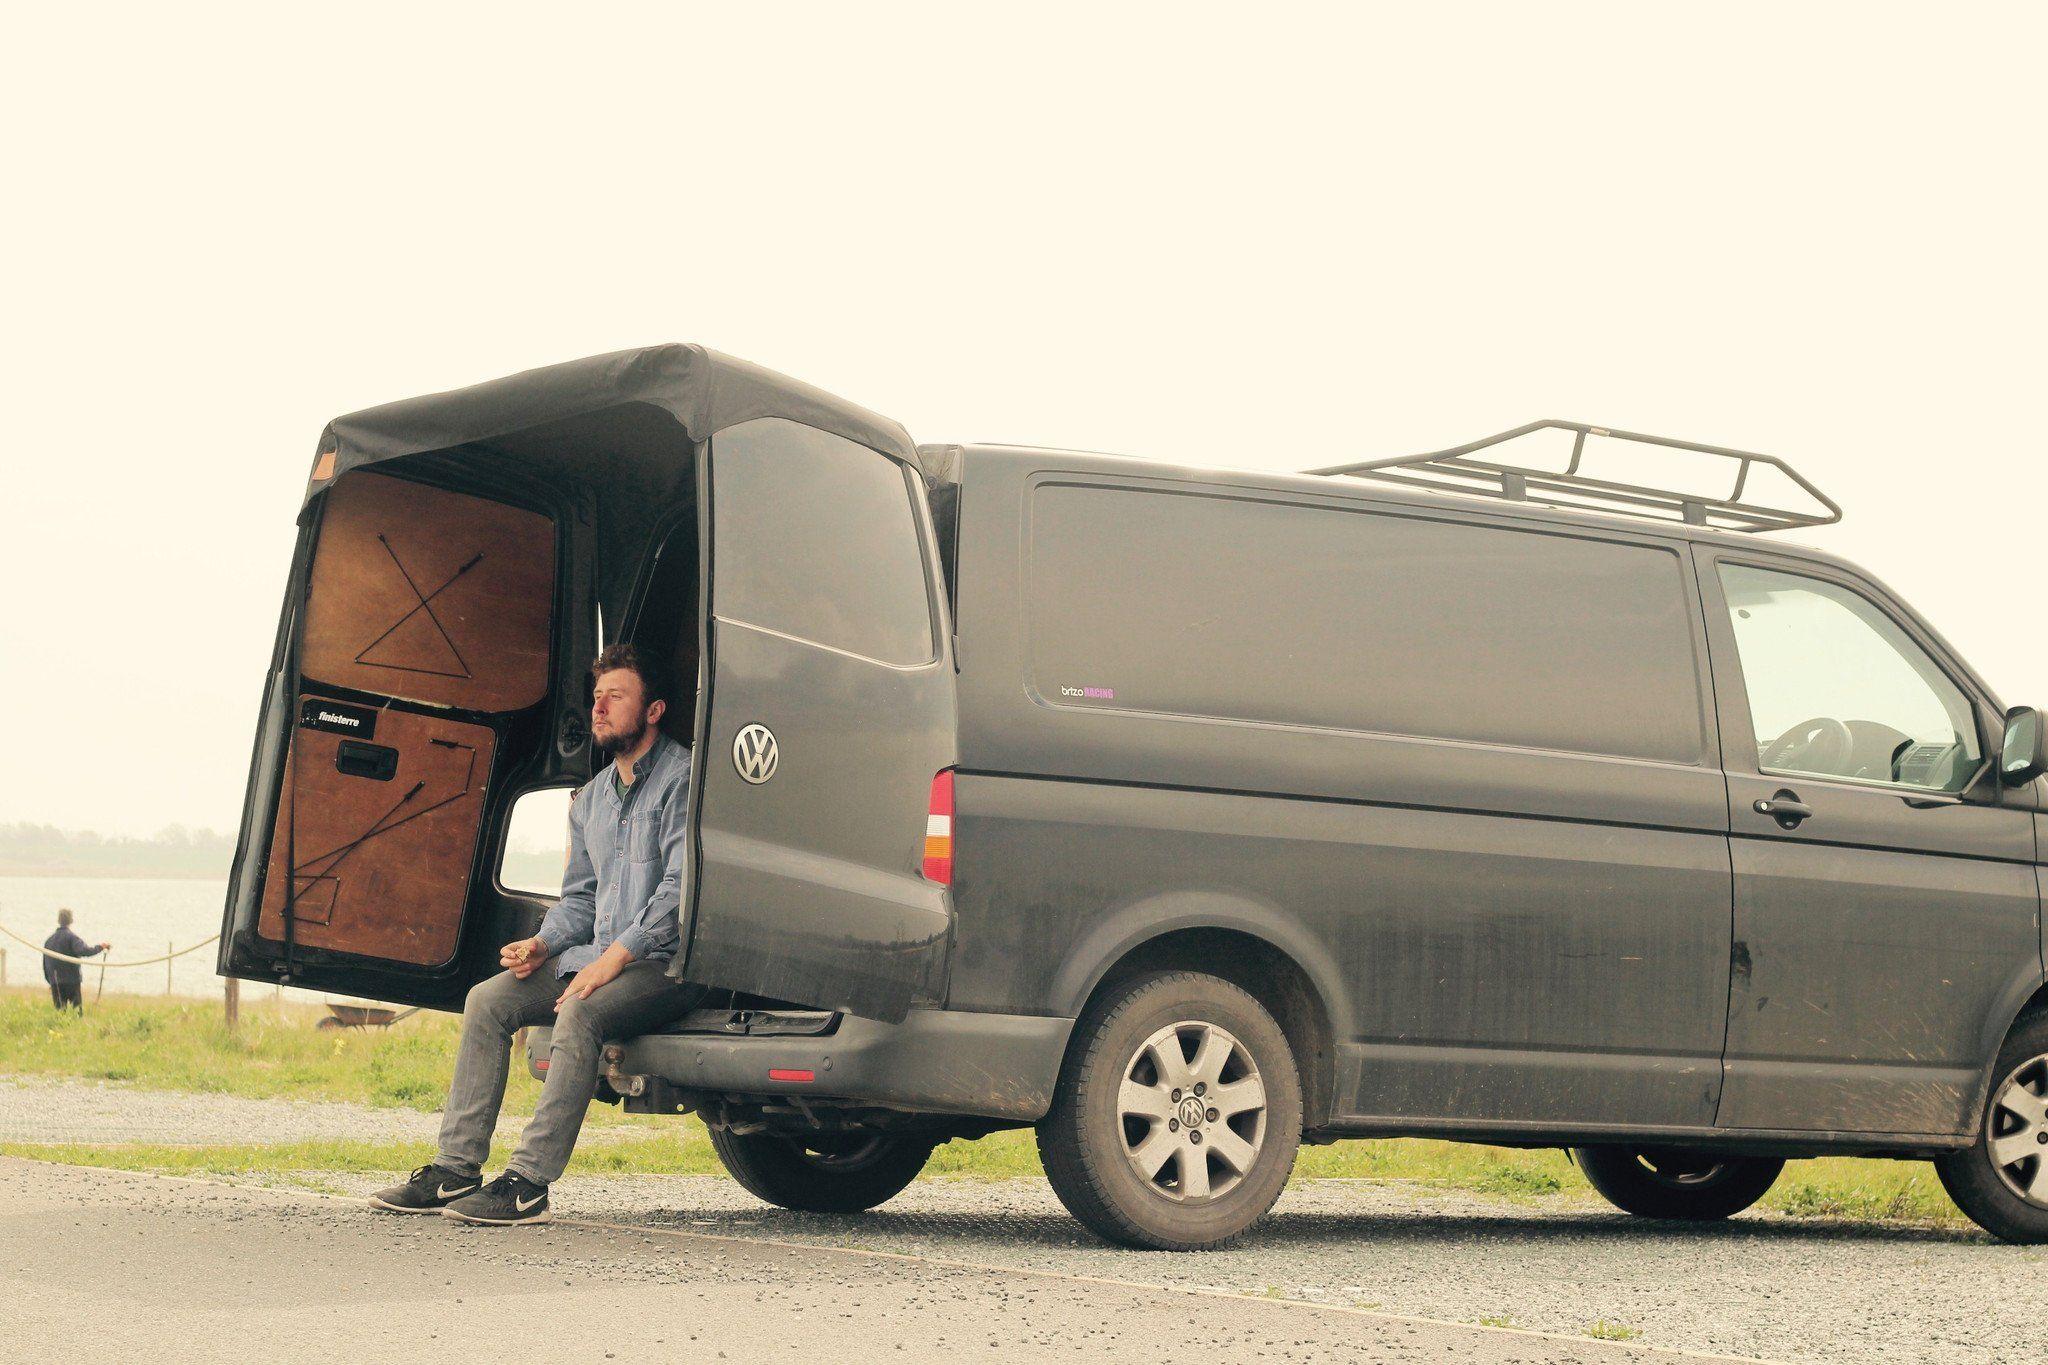 Volkswagen Transporter Barn Door Awning Camping Van